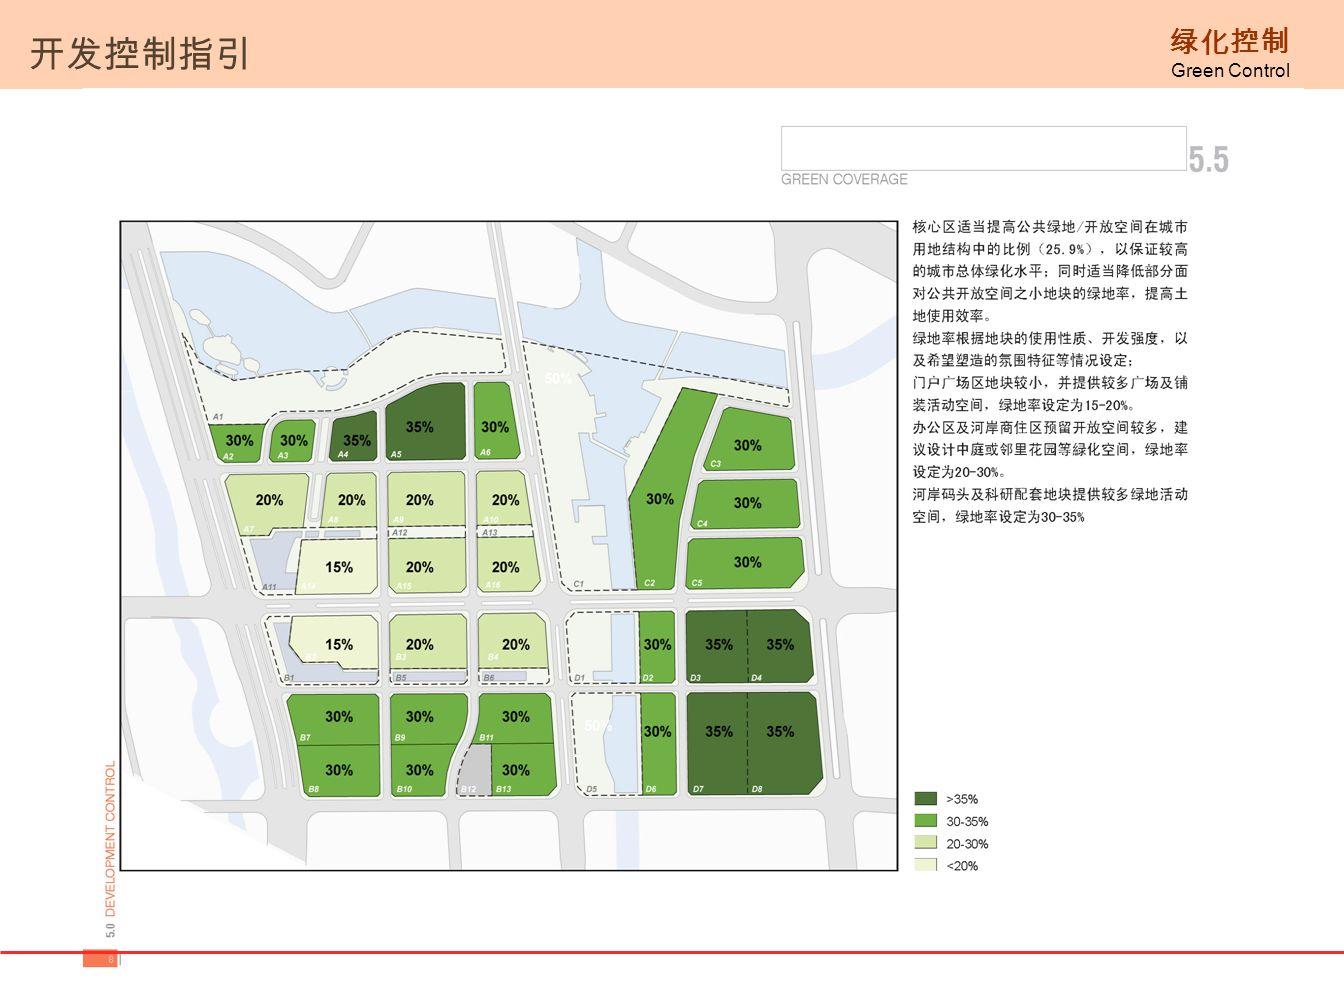 开发控制指引 绿化控制 Green Control